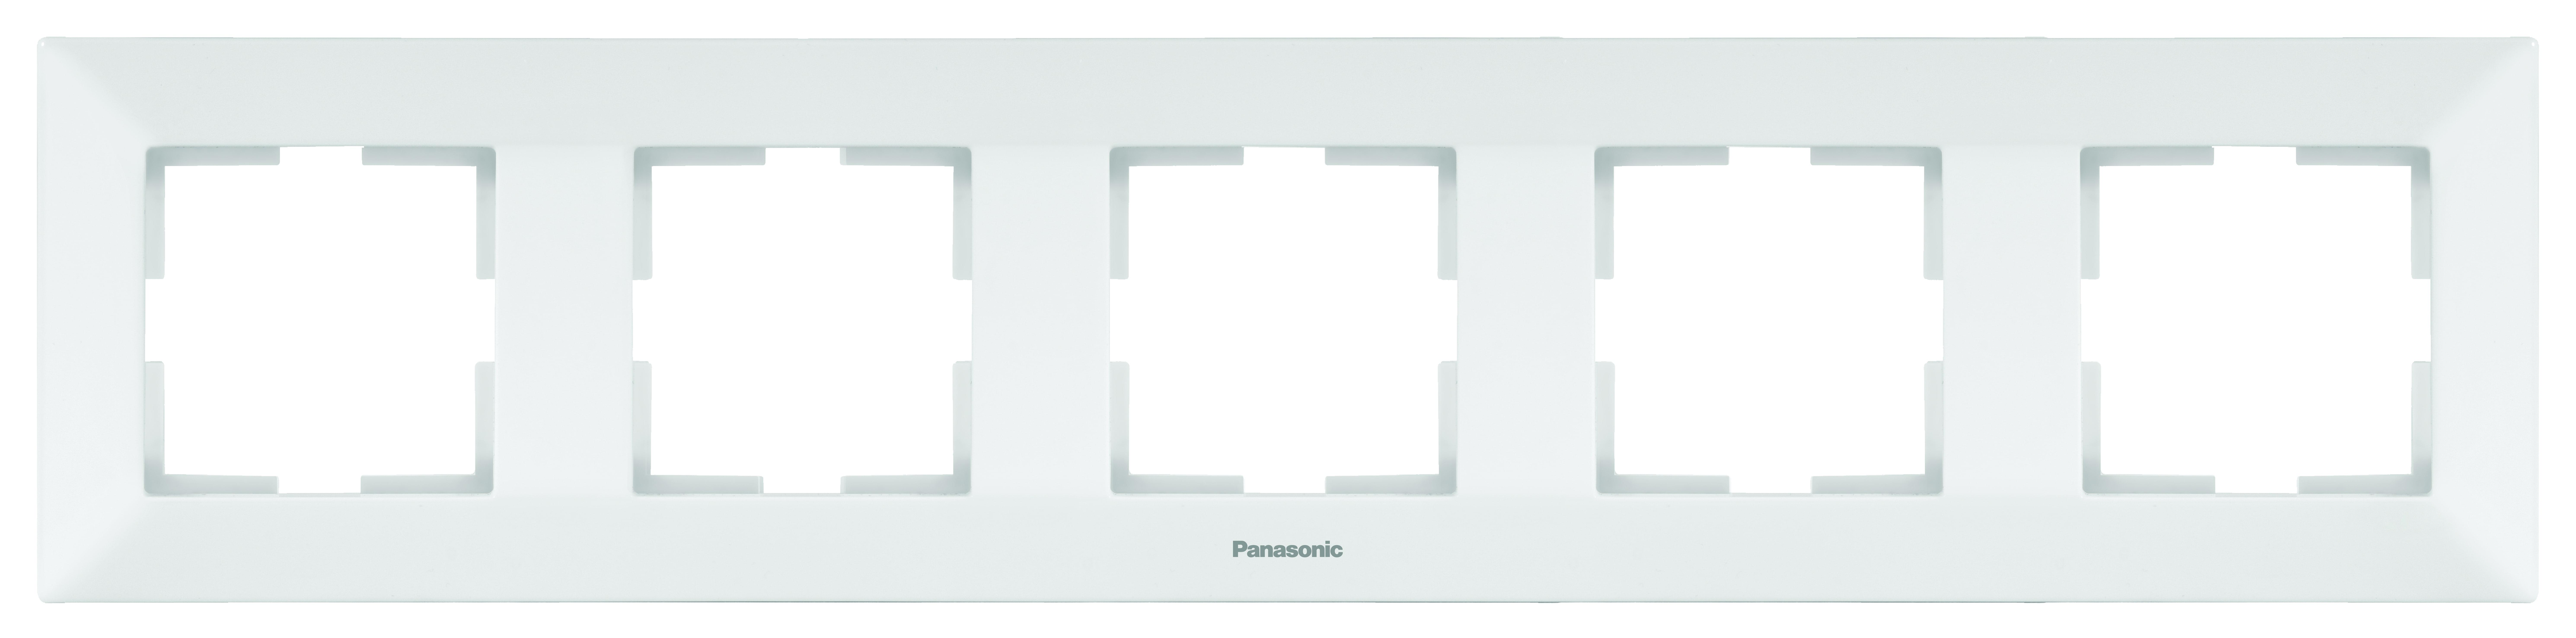 Рамка Panasonic Wktf0814-2bg-res arkedia свч panasonic nn st251wzte 700 вт белый